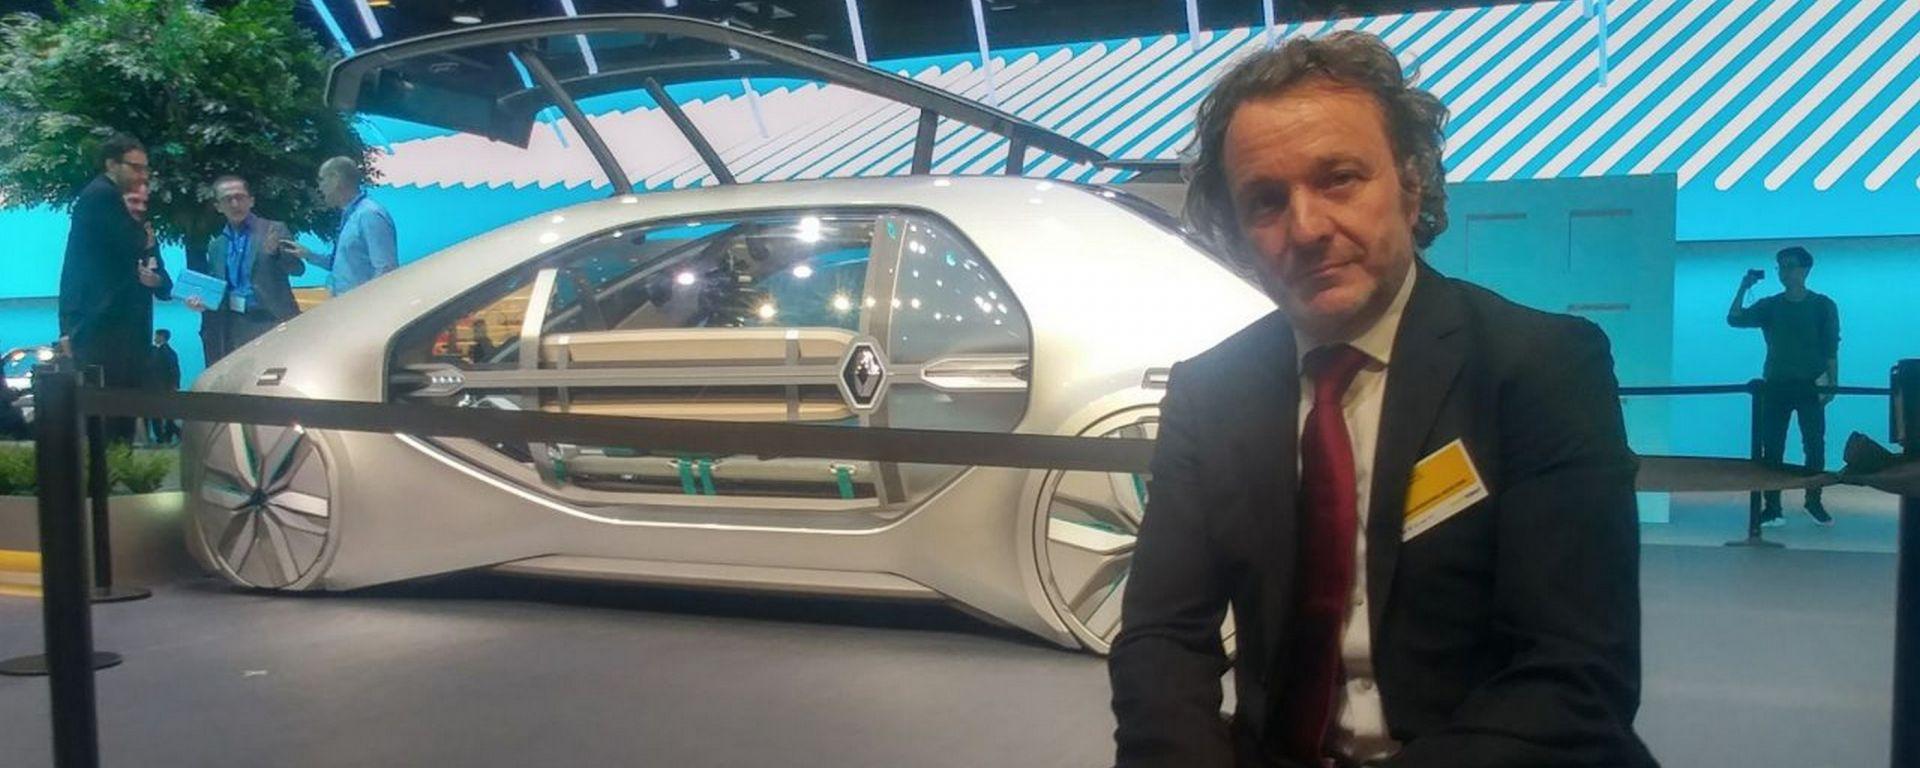 Renault: in scena EZ-GO, il robotaxi a guida autonoma